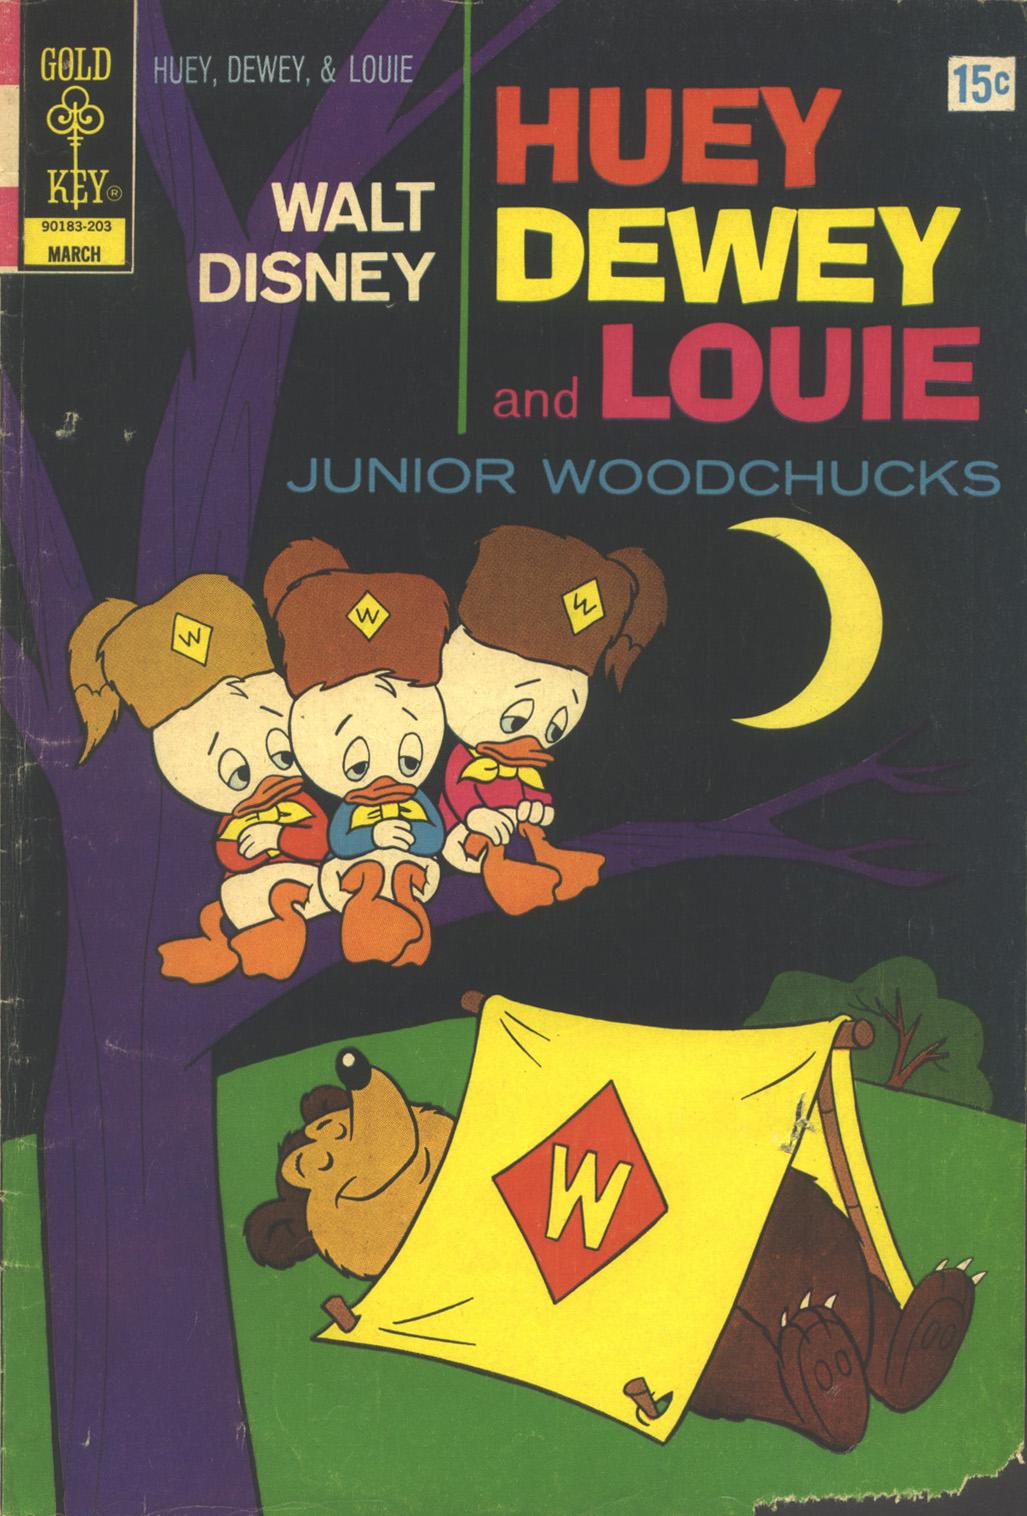 Huey, Dewey, and Louie Junior Woodchucks 13 Page 1